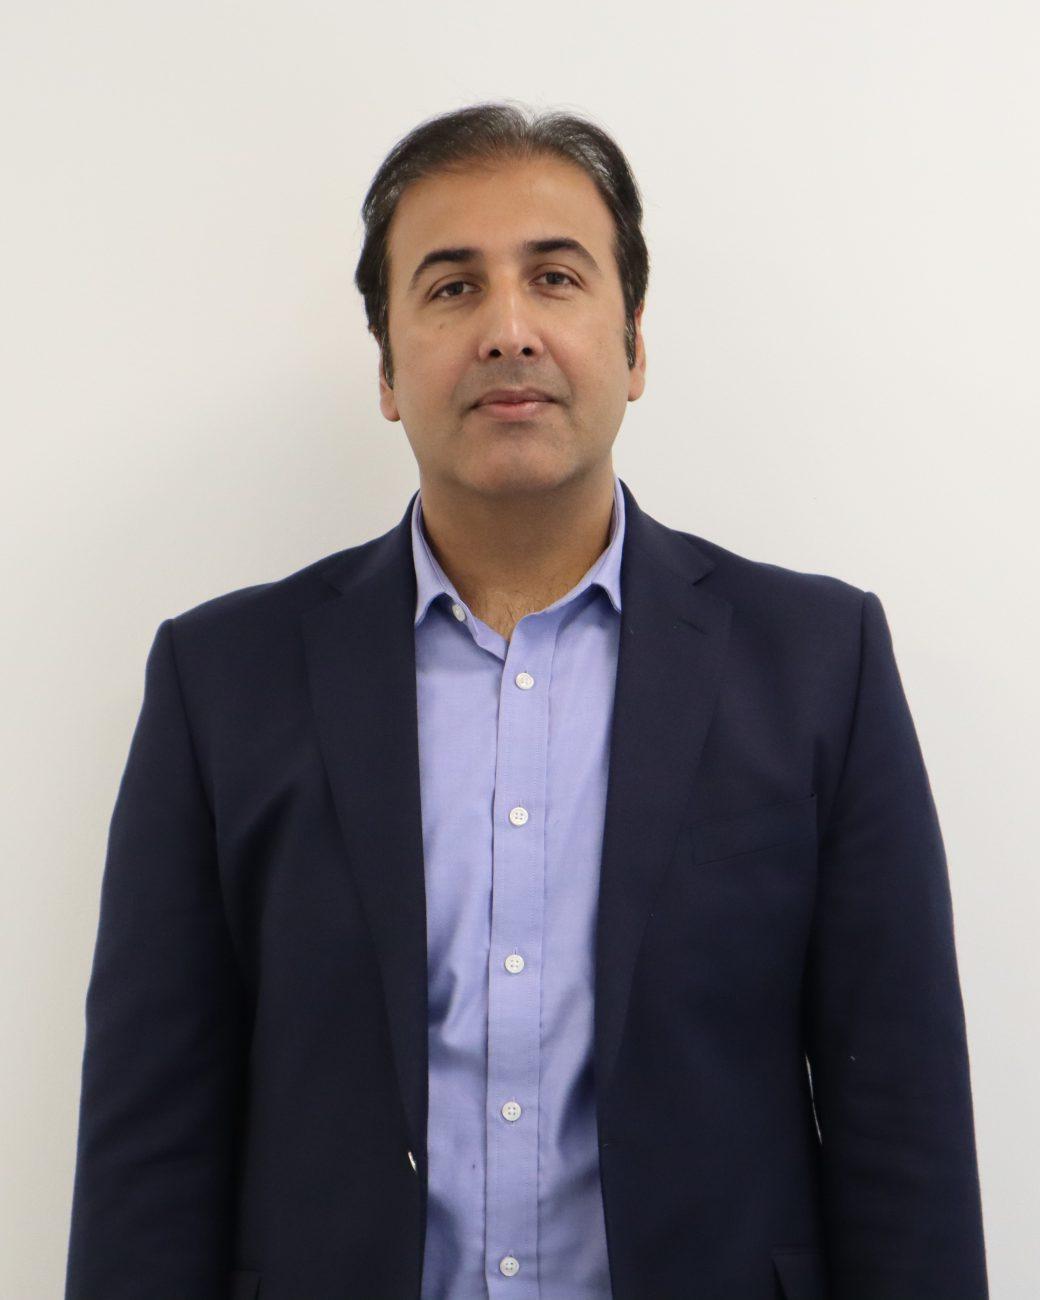 Imad Nawaz